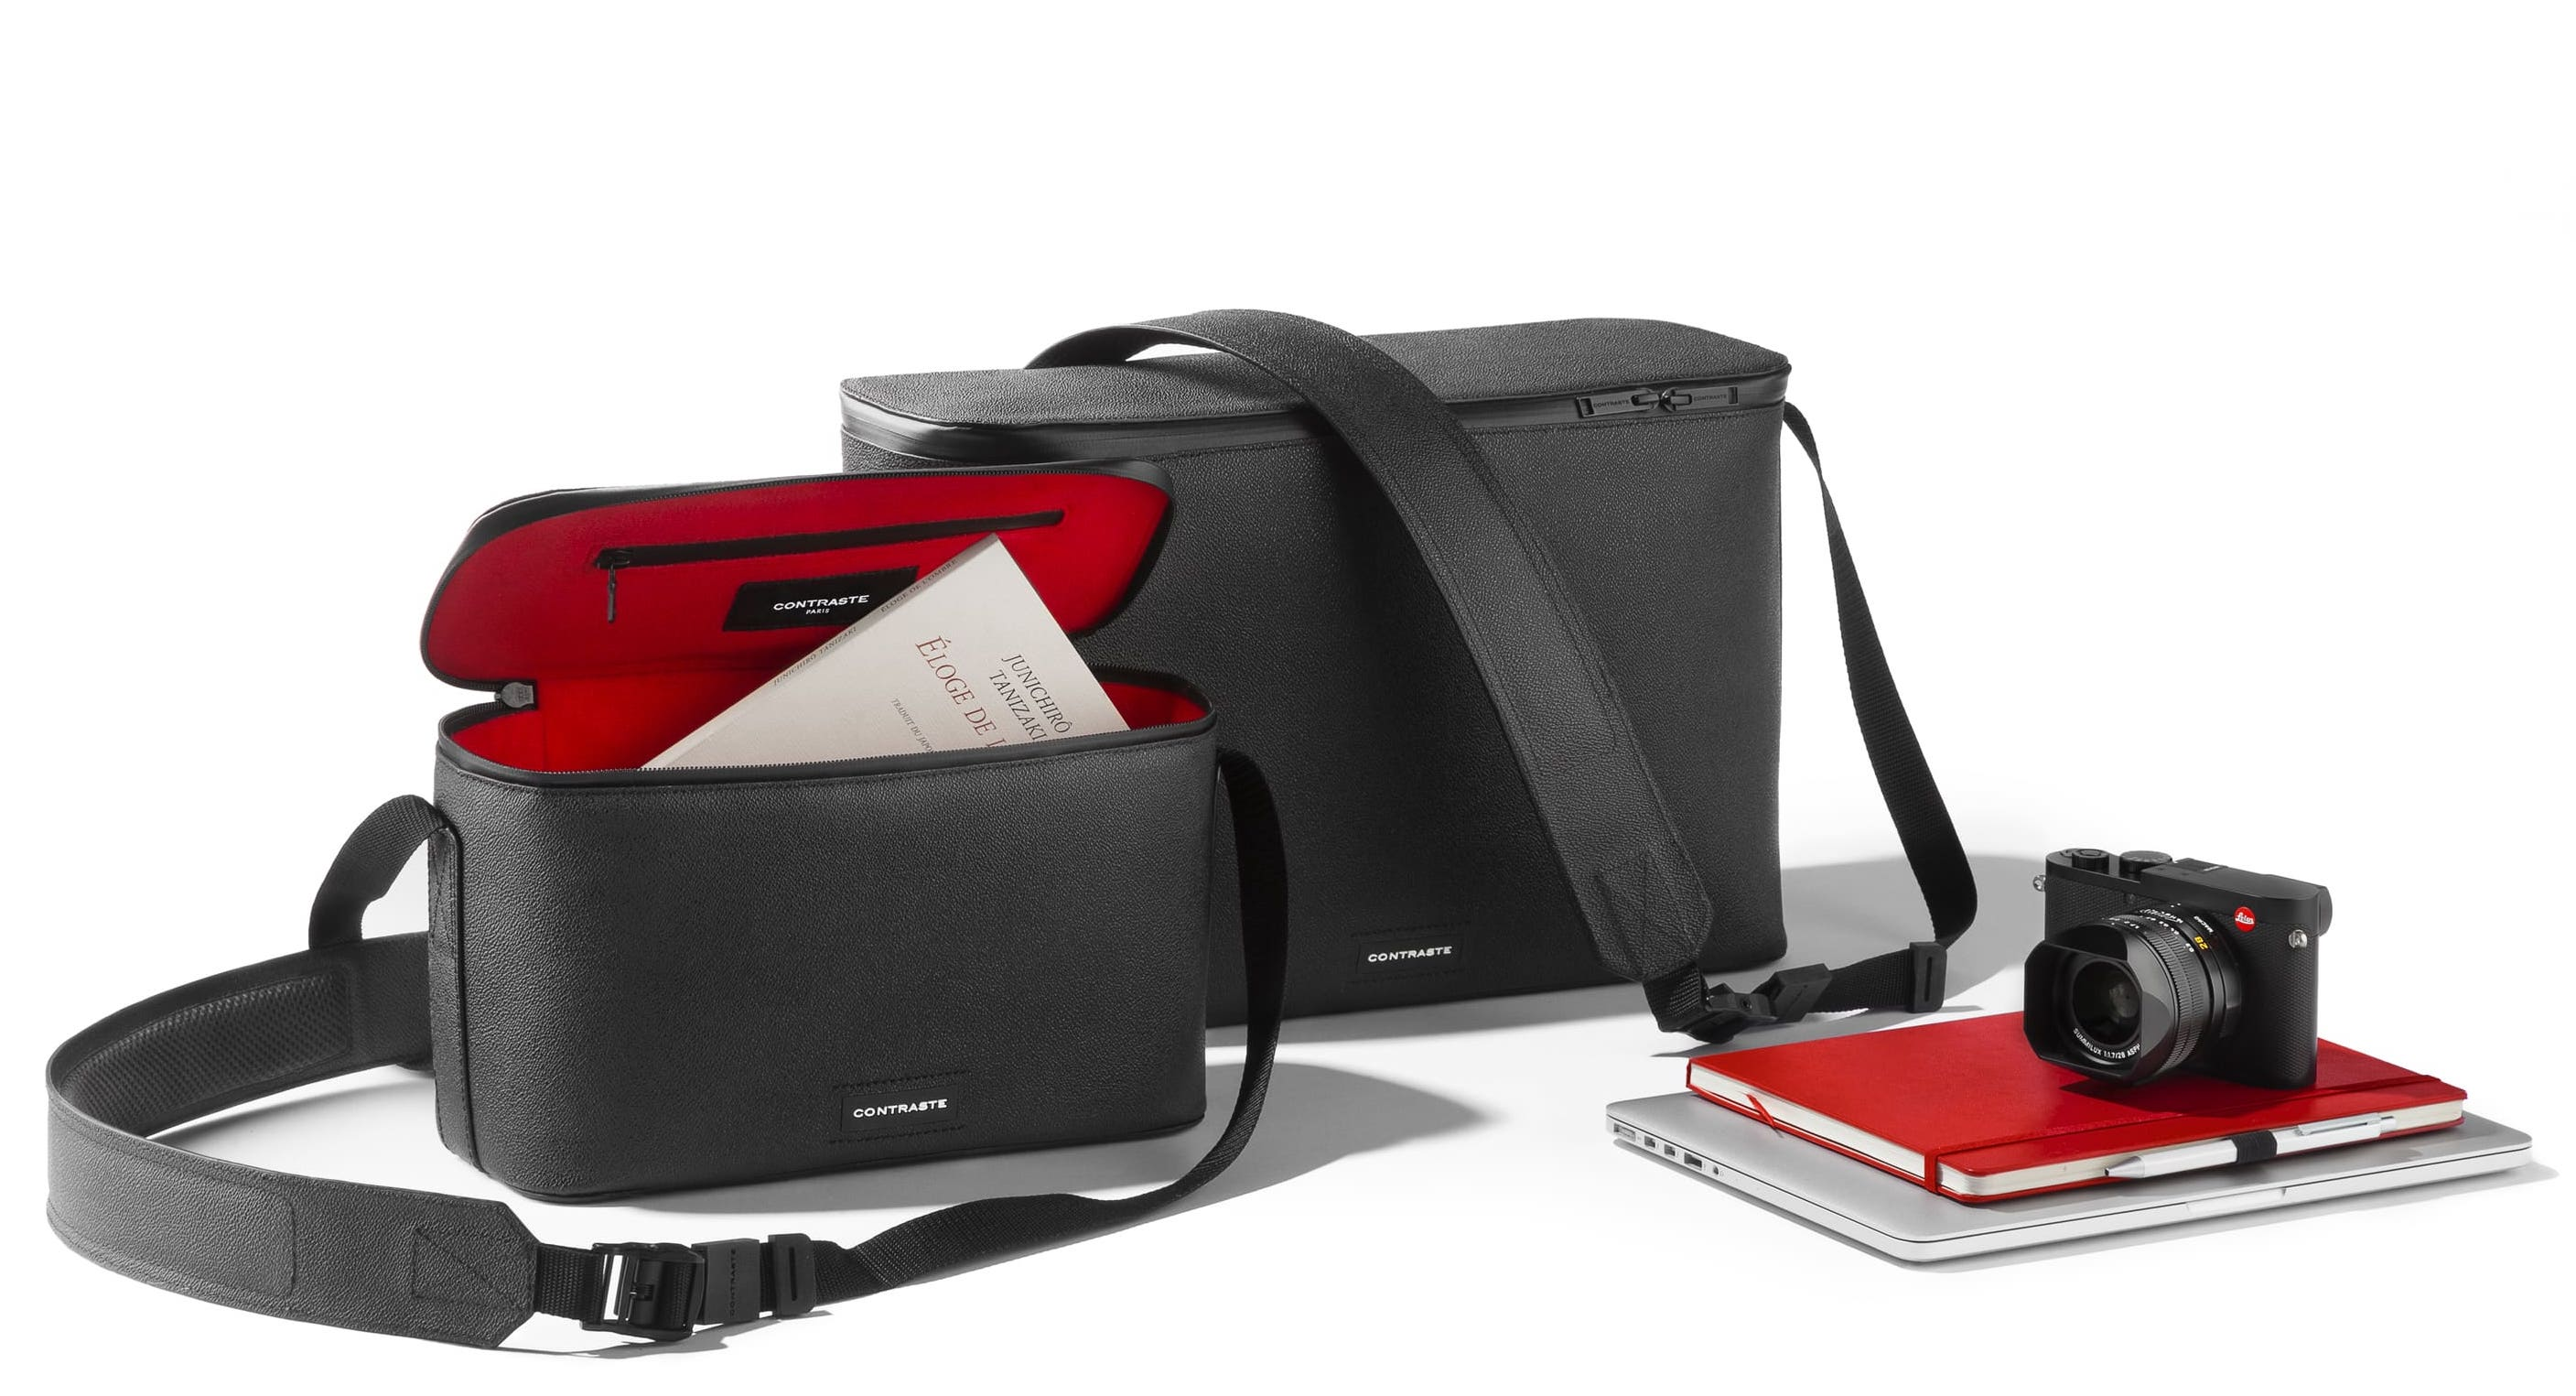 camera bag best purse women black leather small travel designer shoulder waterproof photographer hiking laptop leica contraste paris